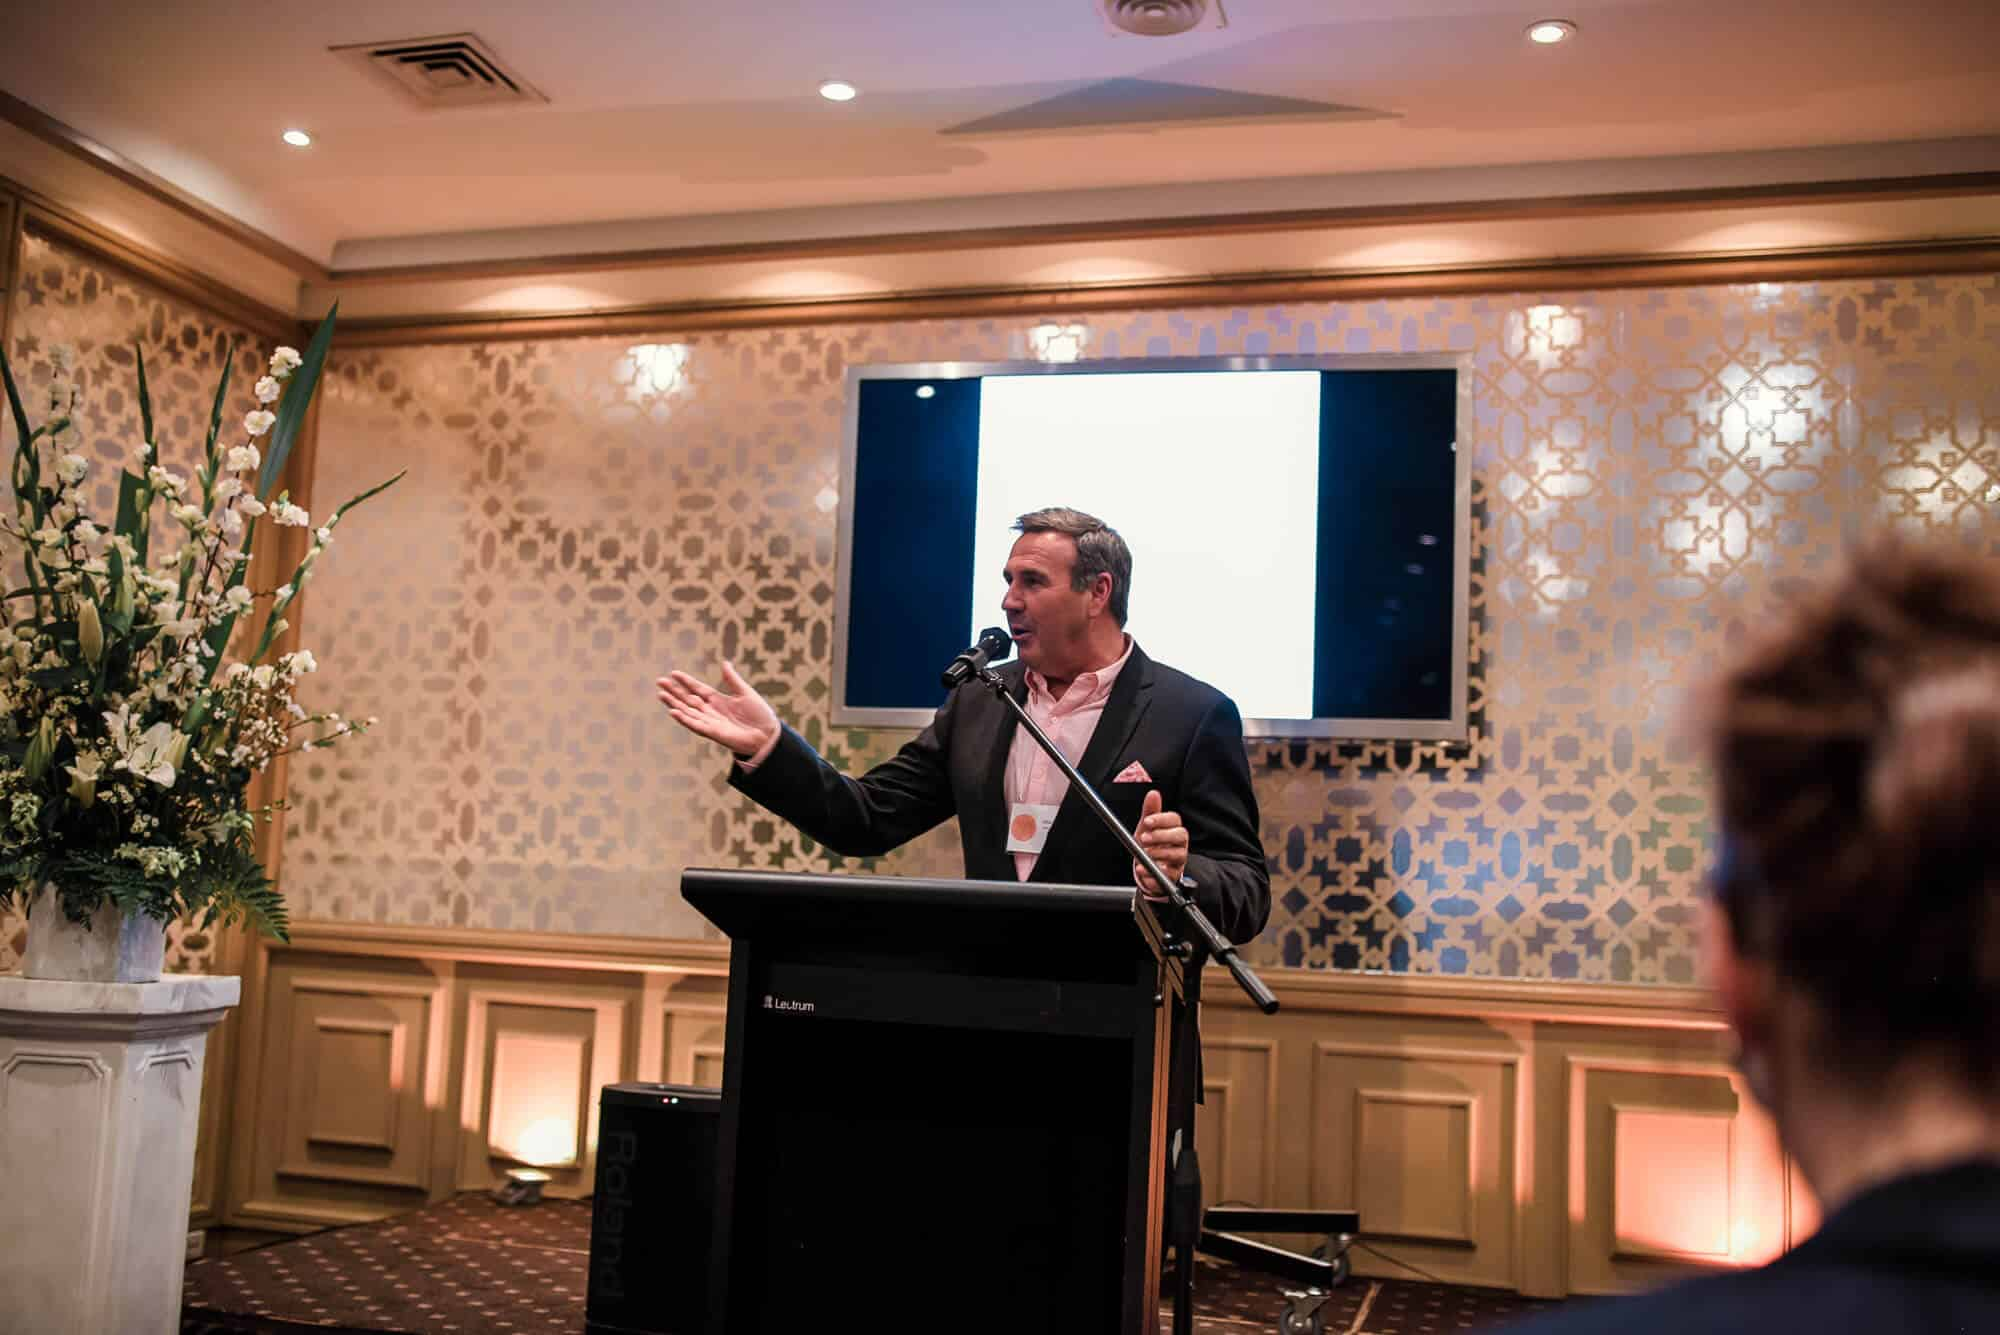 mike-larkan-speaker-wedding-industry-network-events-brighton-savoy